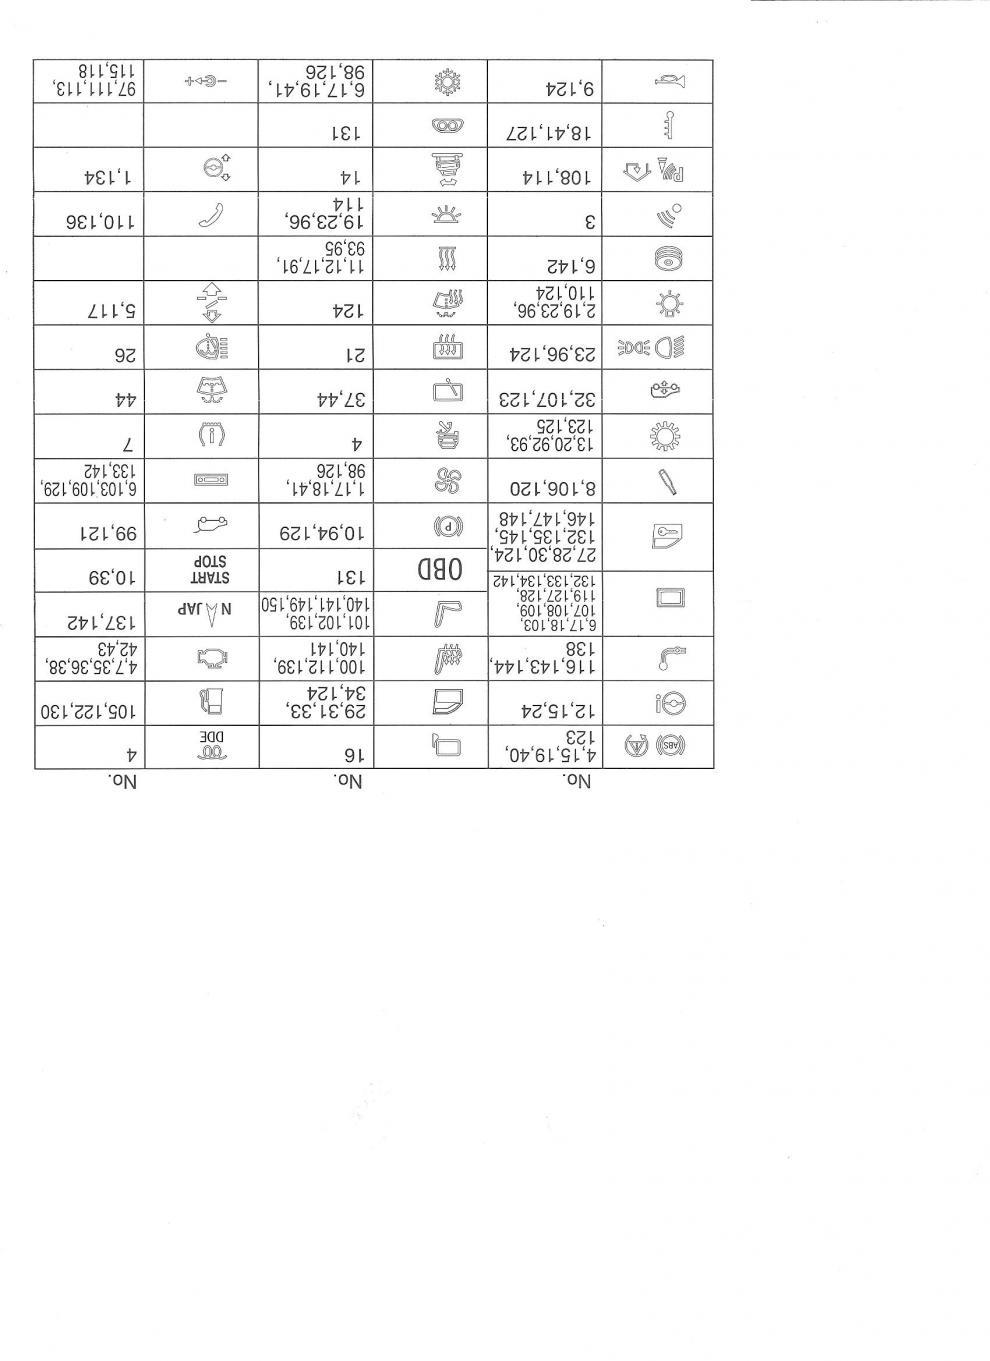 Fuse Box List Location